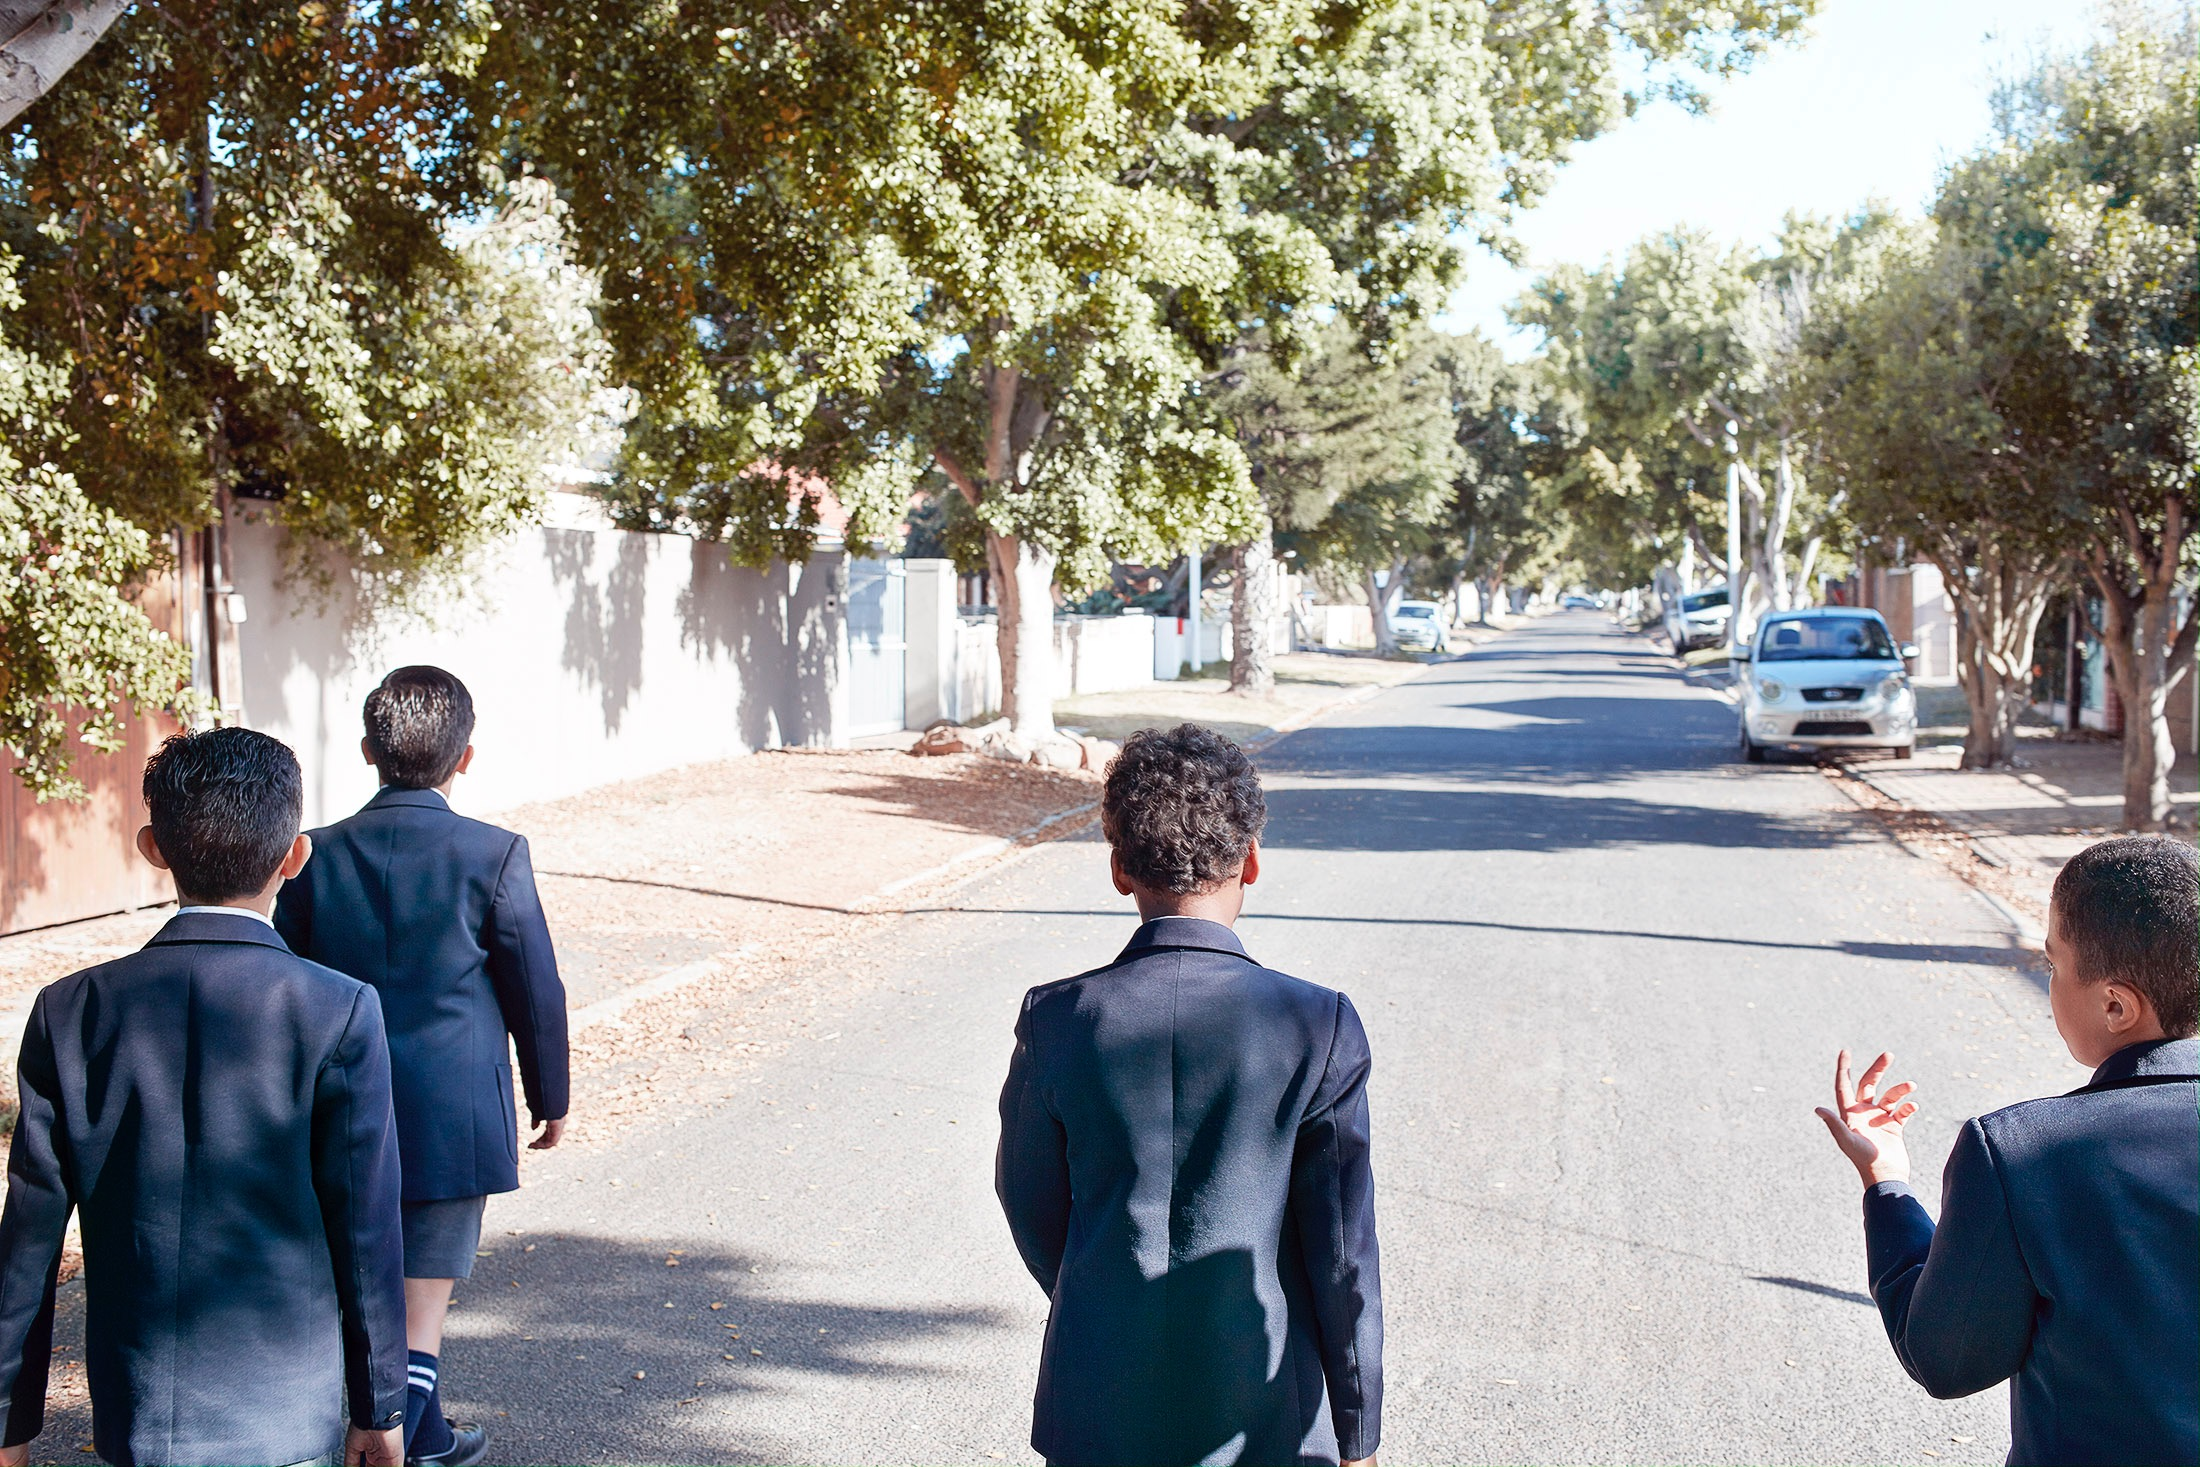 photo photography photographer school uniform education boy boys friends street walk walking backside